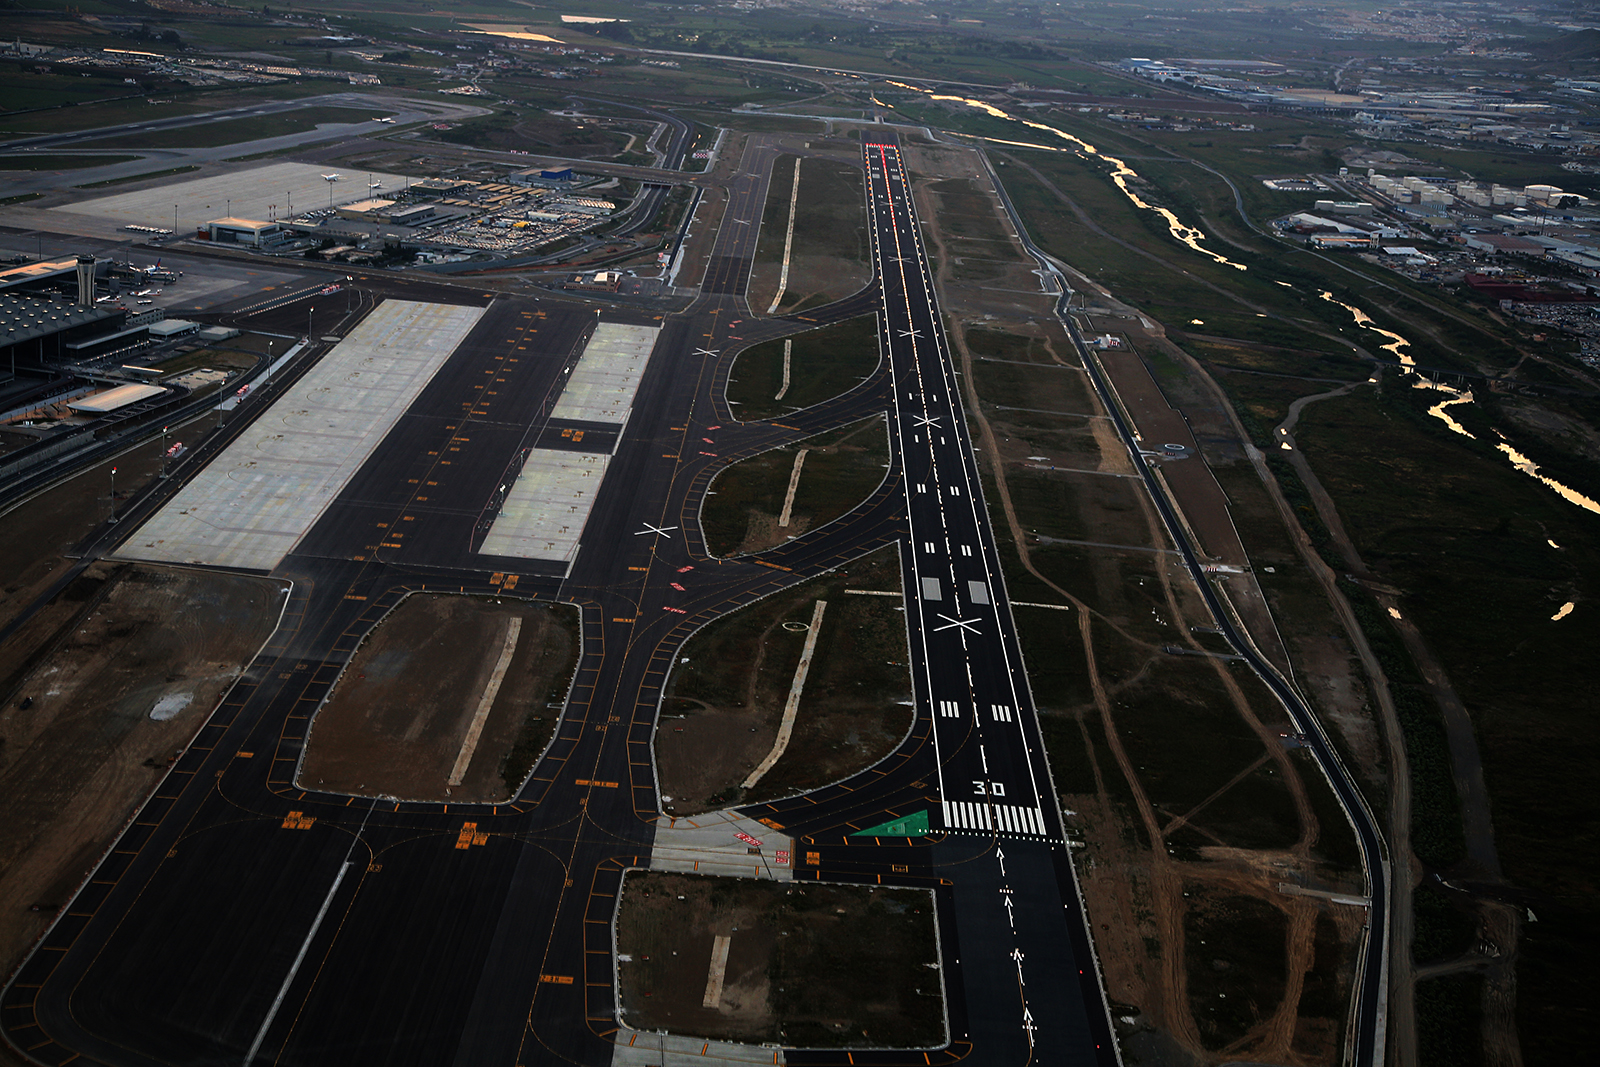 Los controladores aéreos de Málaga denuncian escasez de personal